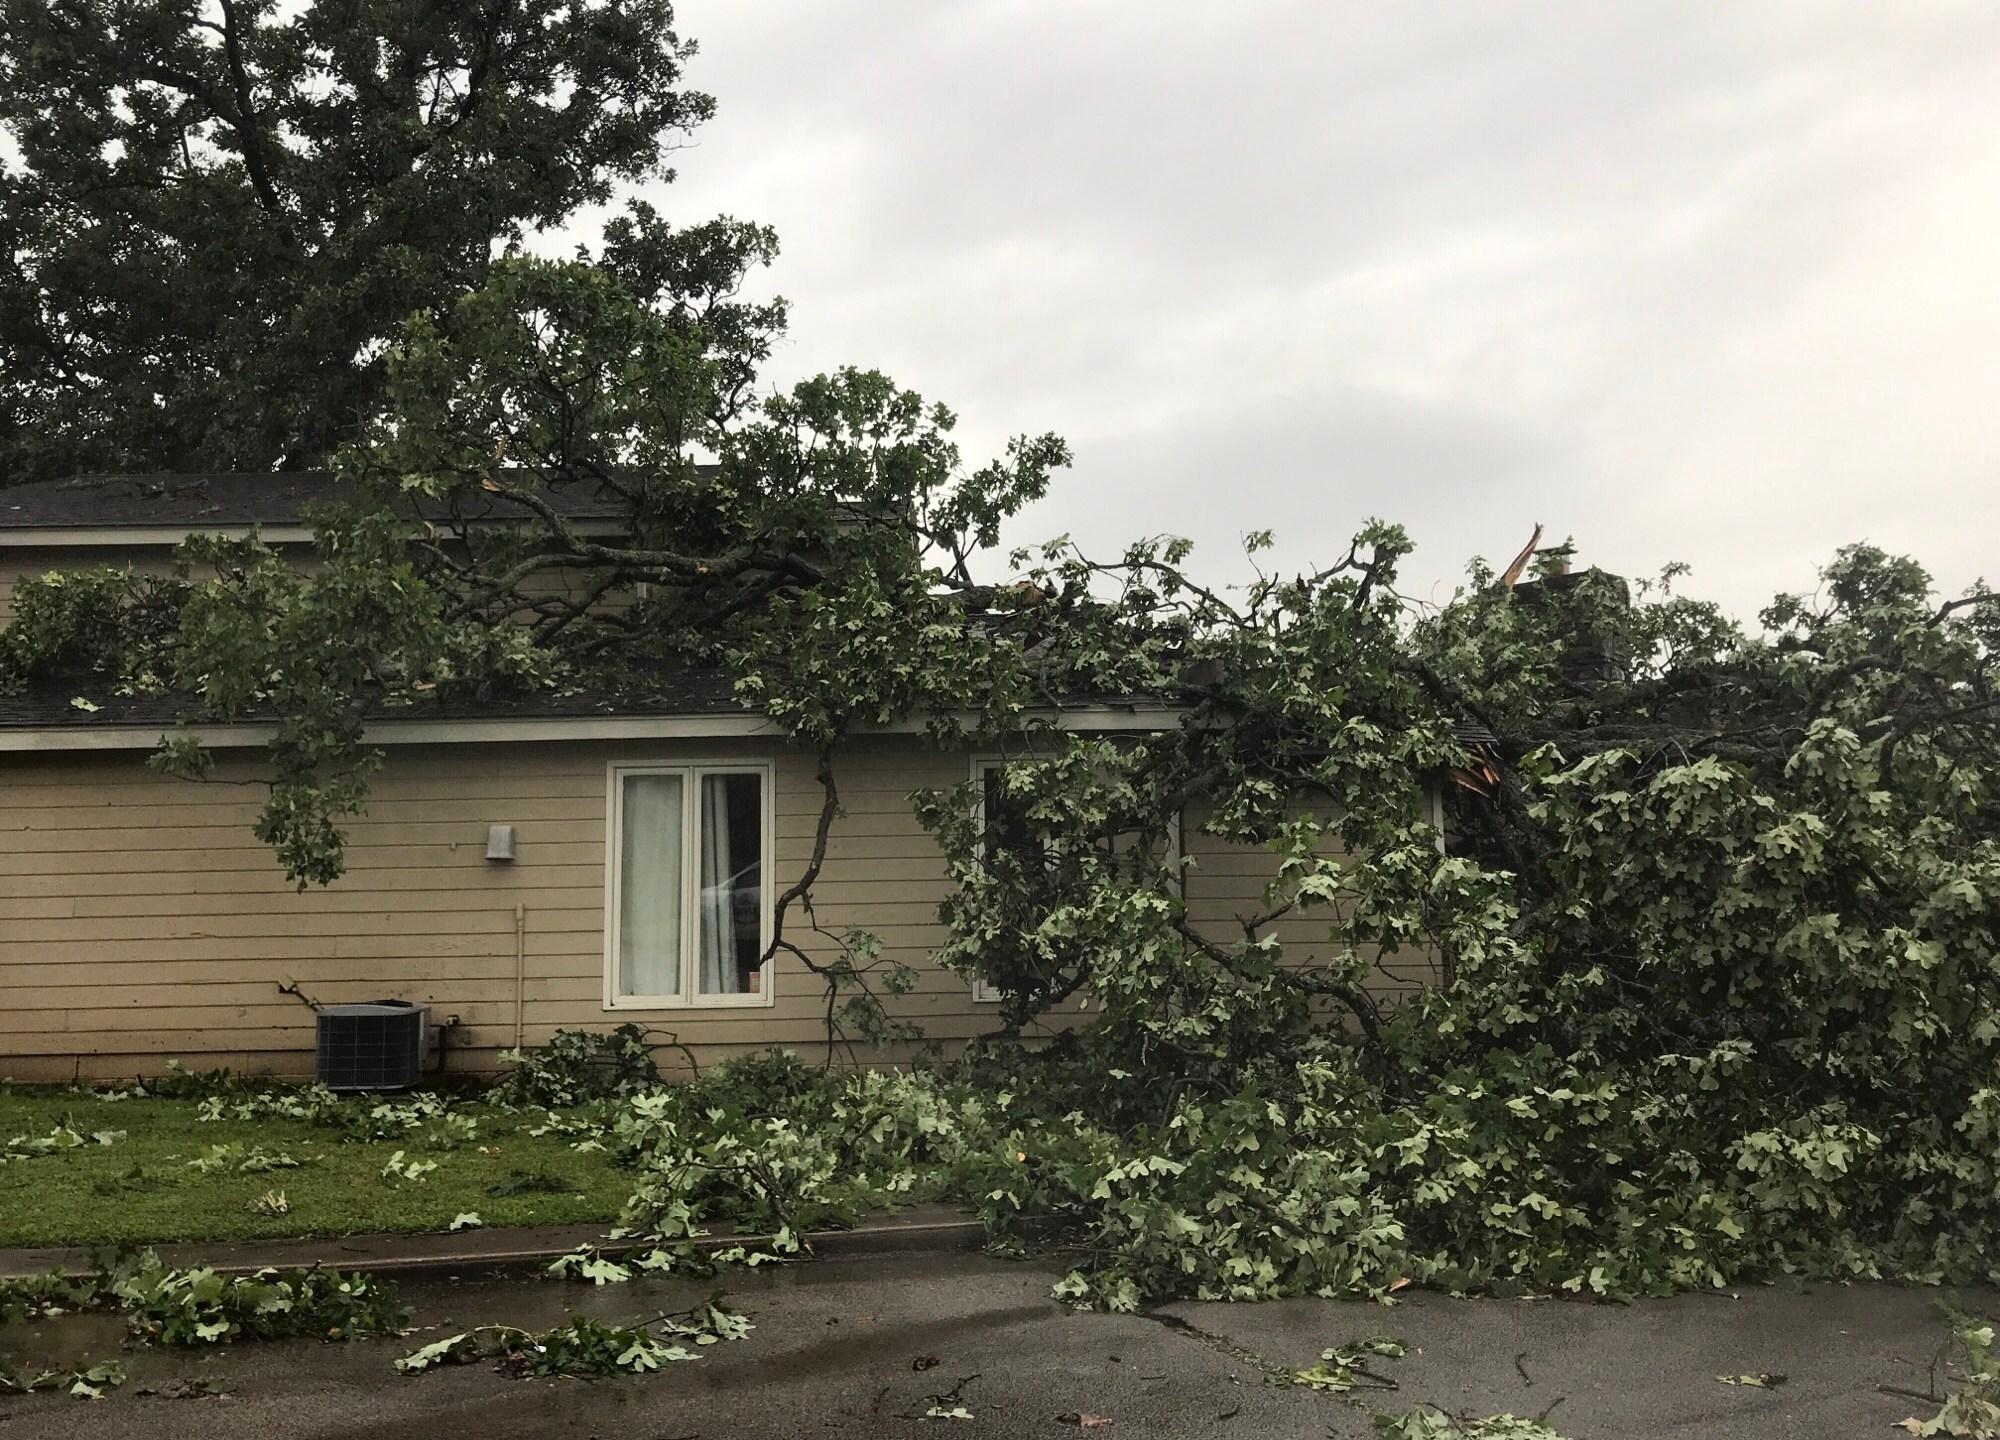 Siloam Storm Damage 2_1559169352798.png.jpg